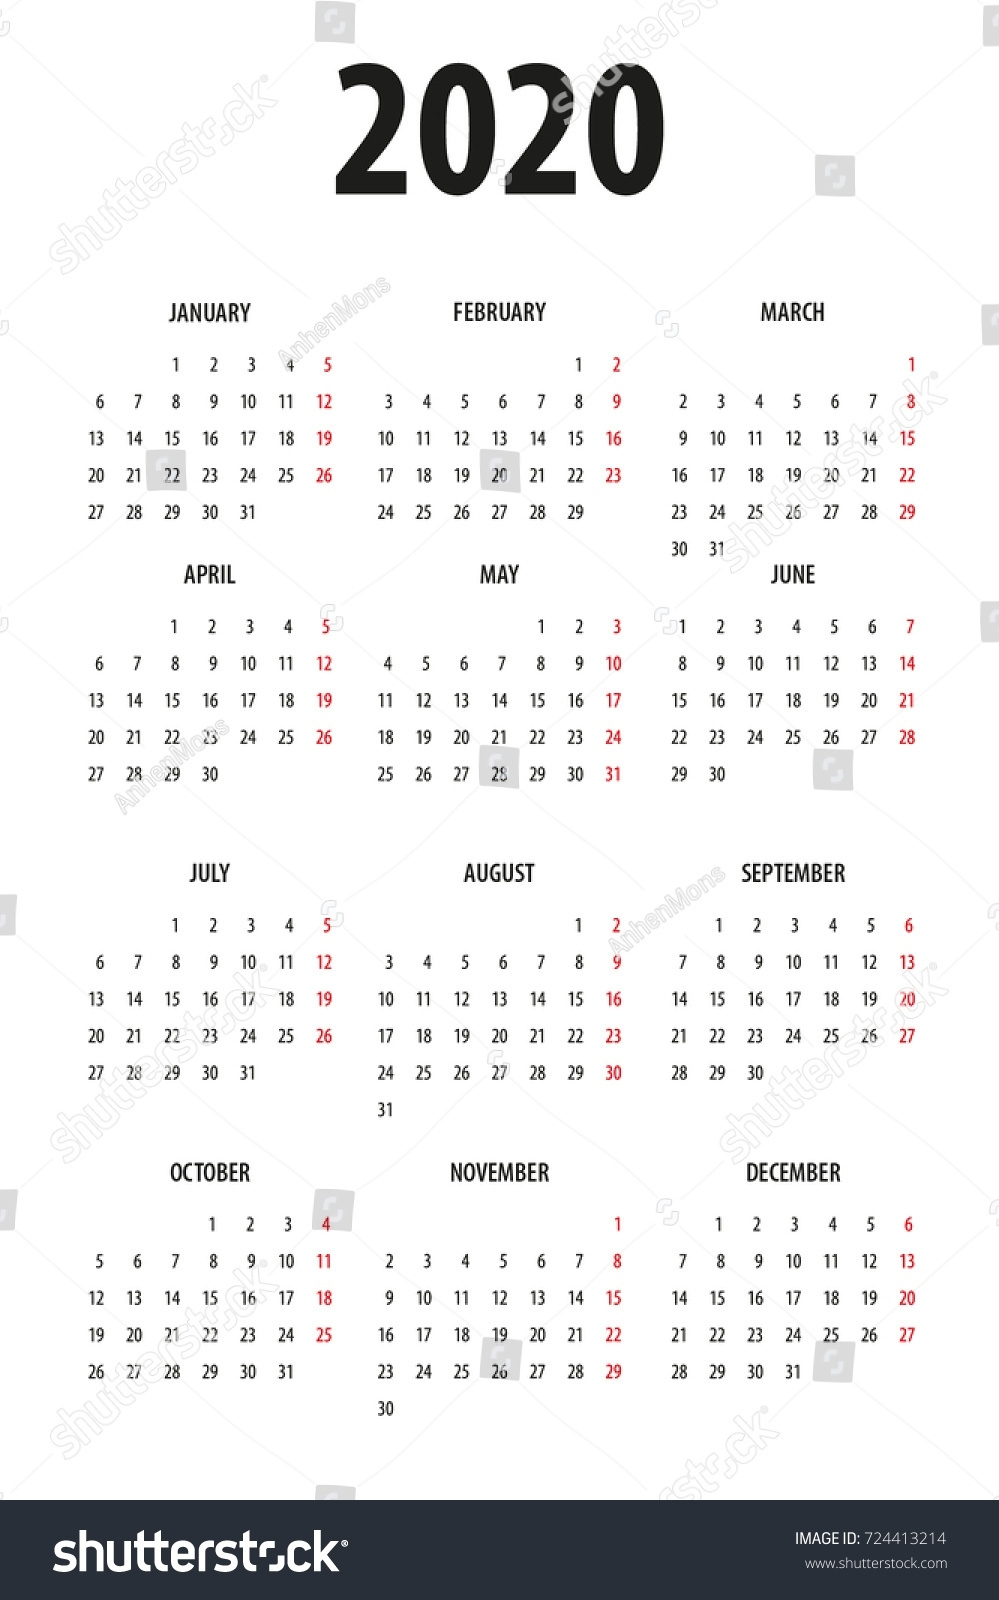 2020 Calendar Monday To Sunday